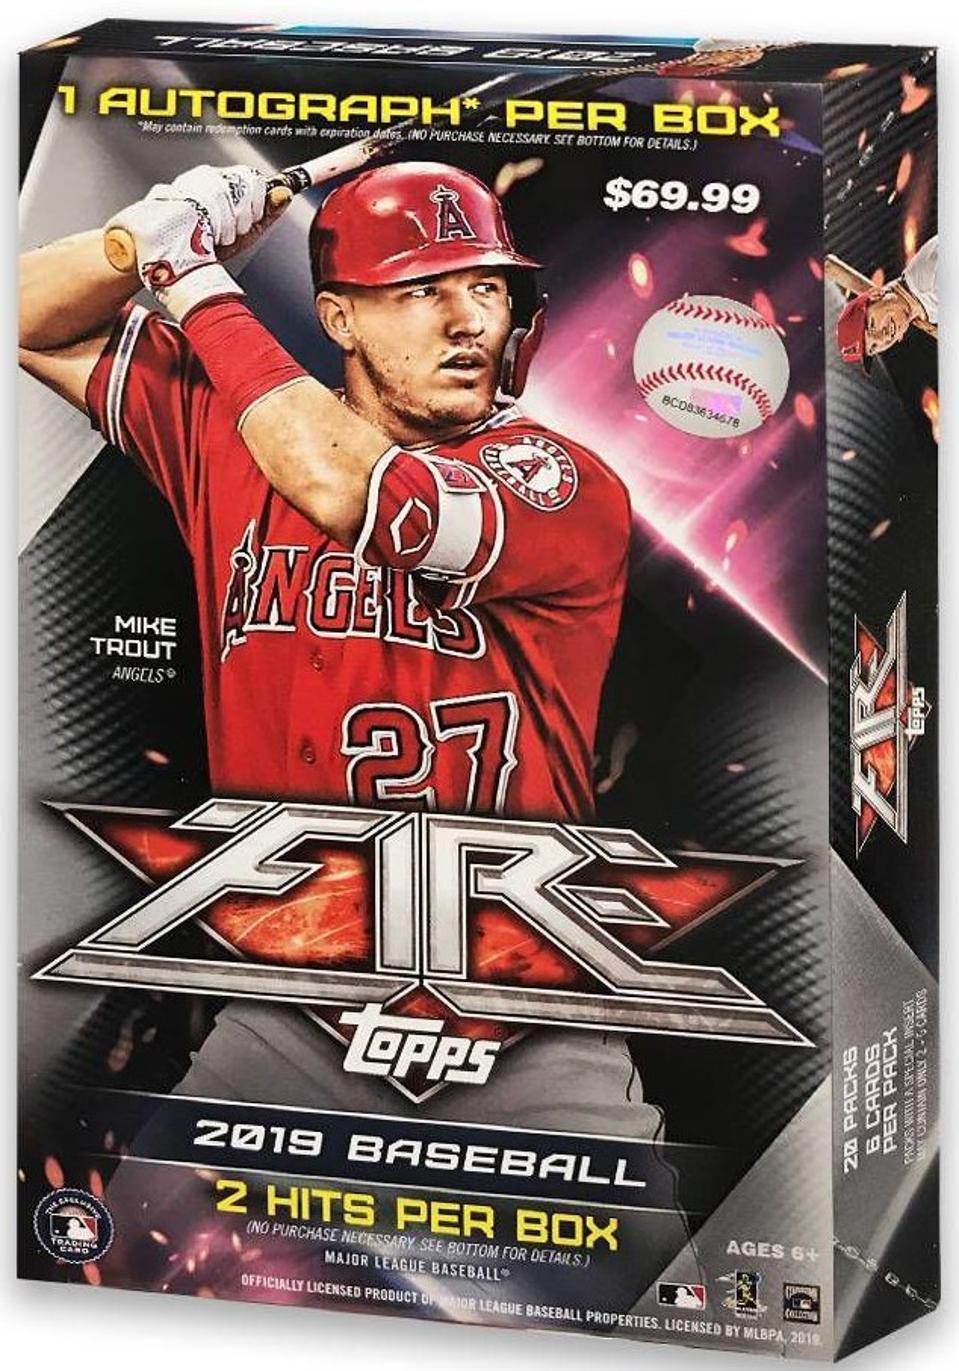 2019 Topps Fire Baseball Box.